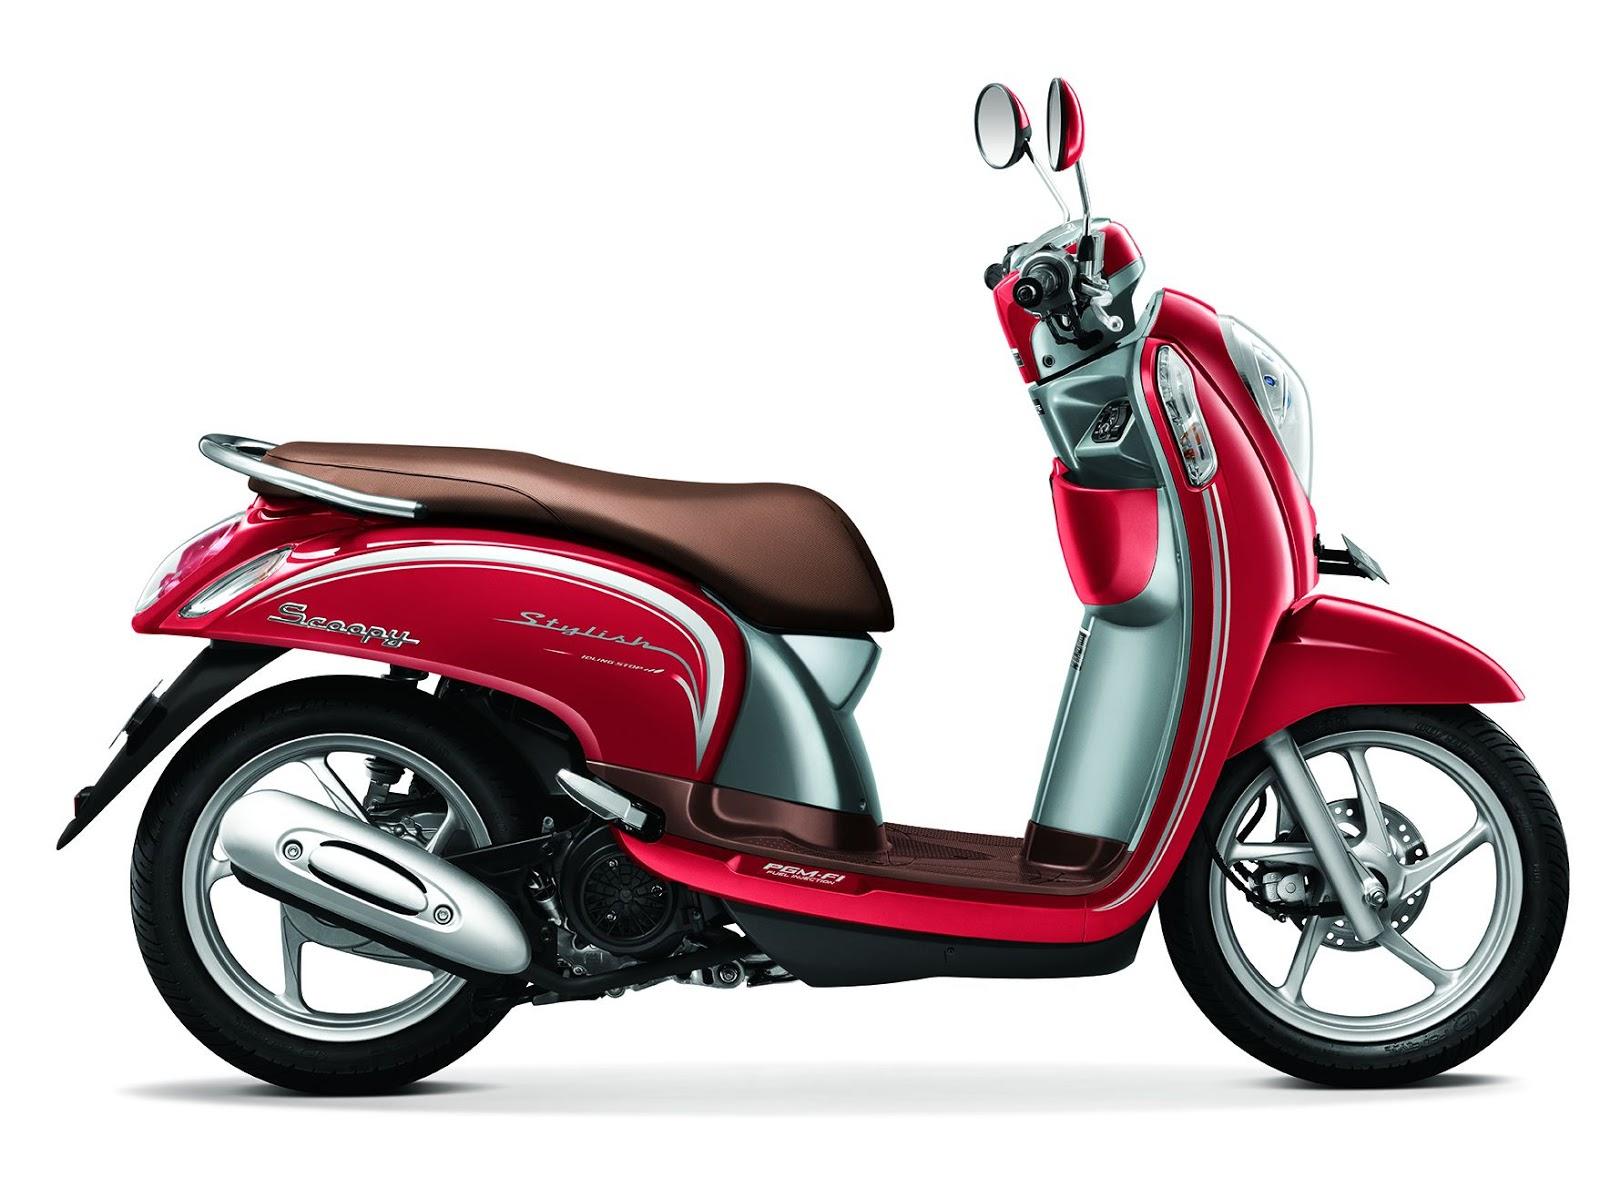 Harga dan Spesifikasi Motor Honda Scoopy eSP Terbaru